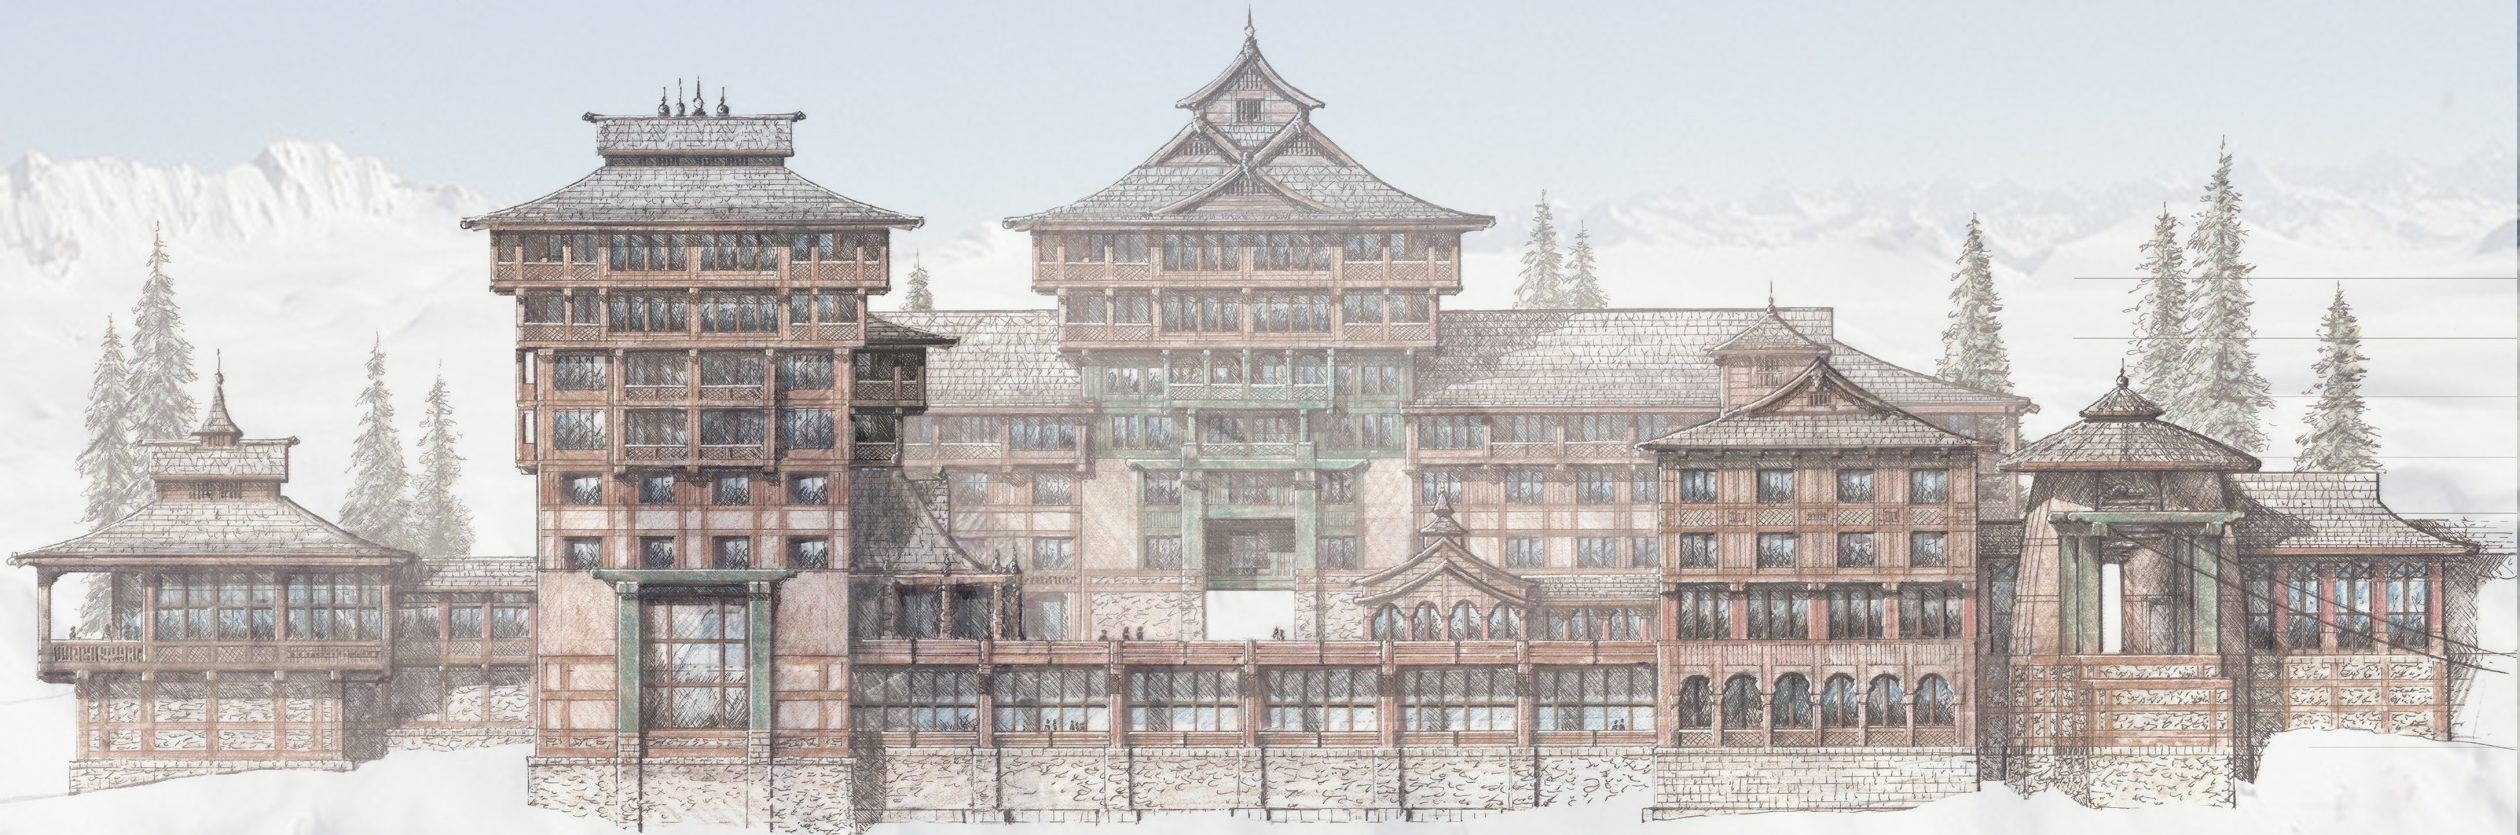 Himalayan Ski Village Concept Jpg 2520 835 Architectural Sketch Skiing Big Ben